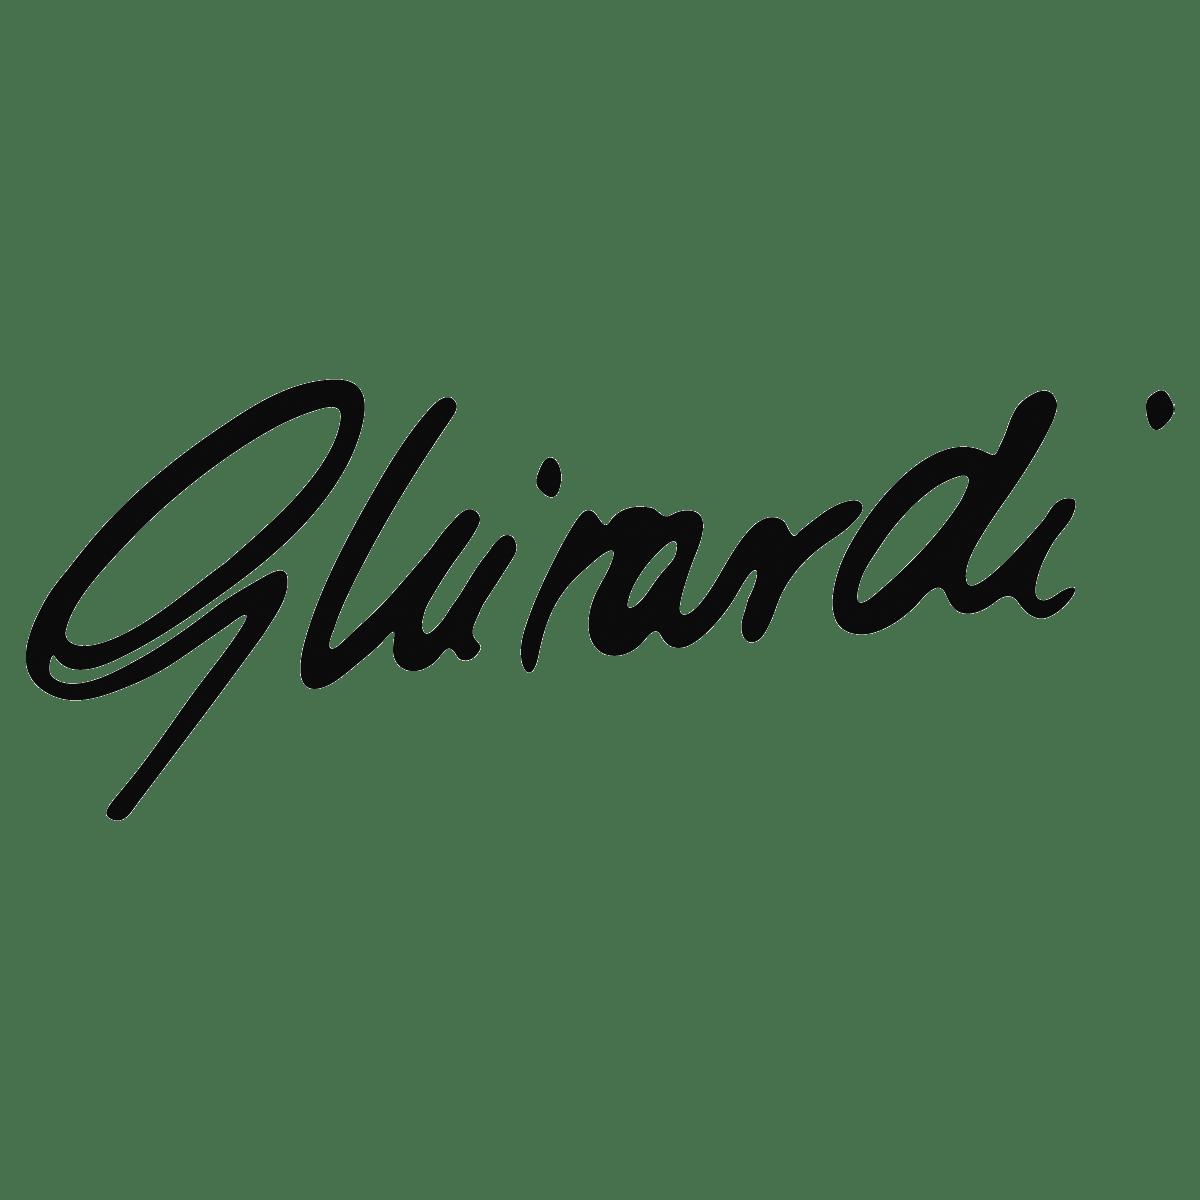 Aufkleber: Ghirardi